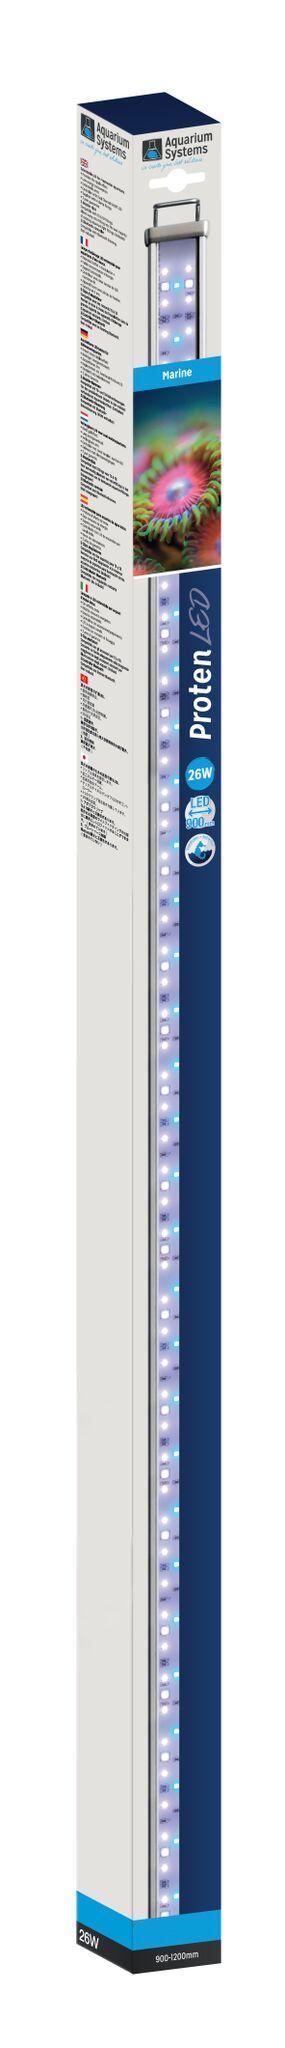 Aquarium Systems Proten LED bar marine 900 - 1200mm 26W